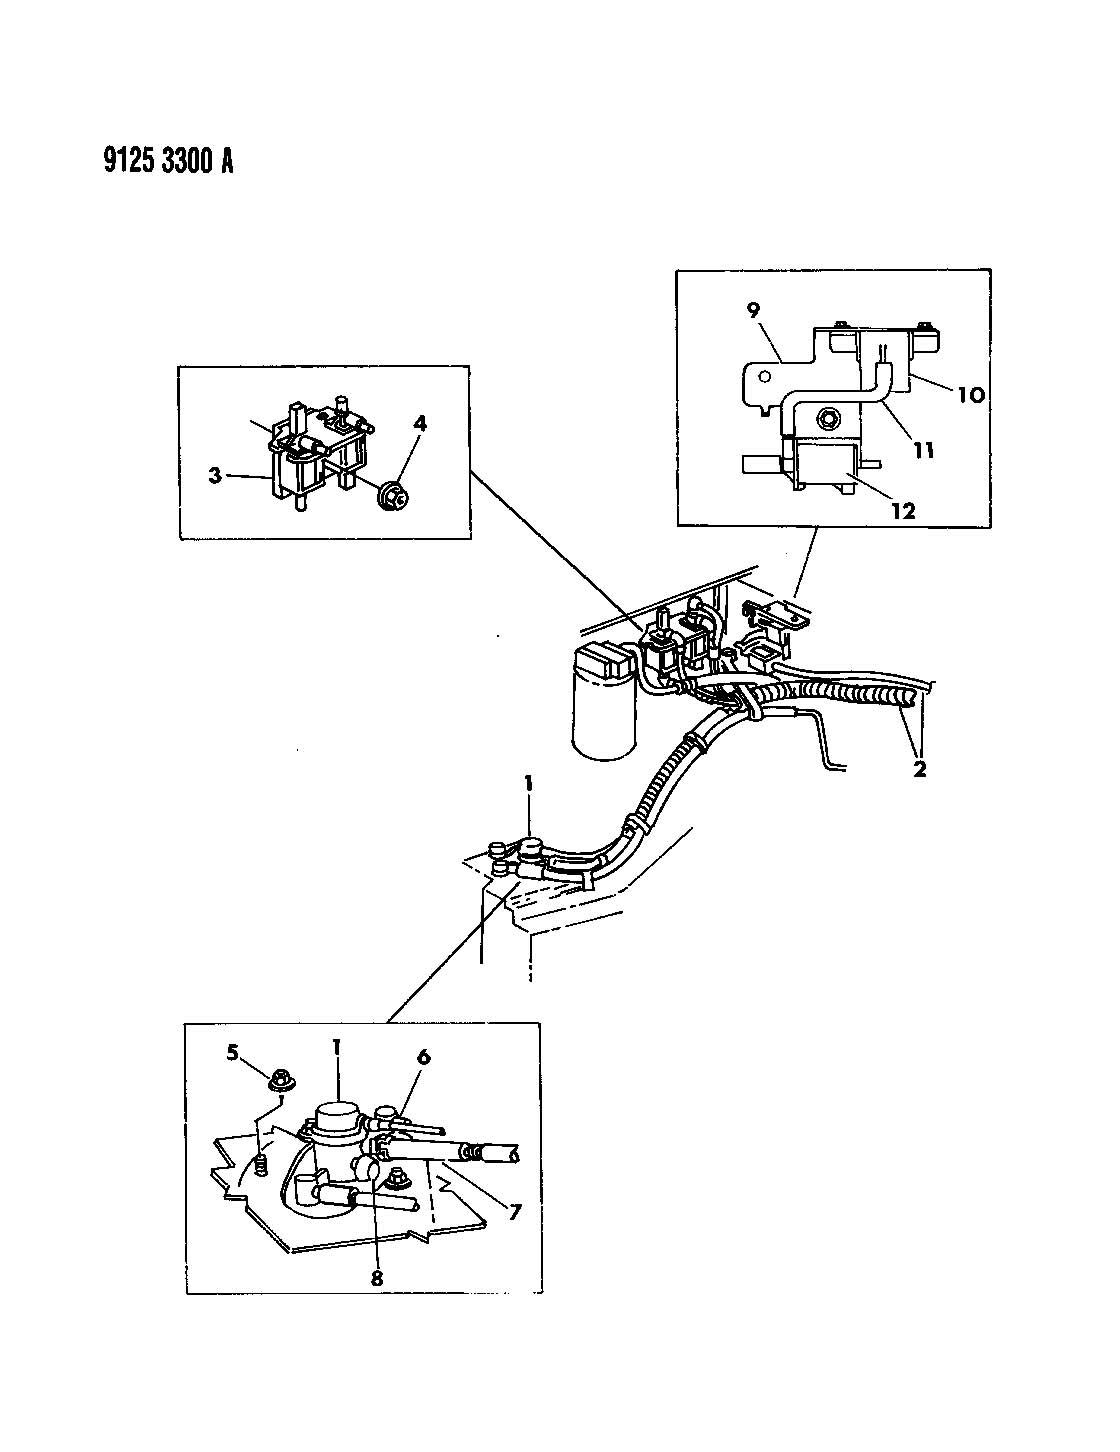 Chrysler Lebaron Gtc 2 2l 4cyl Tc Turbo Ii Cmc 5 Speed